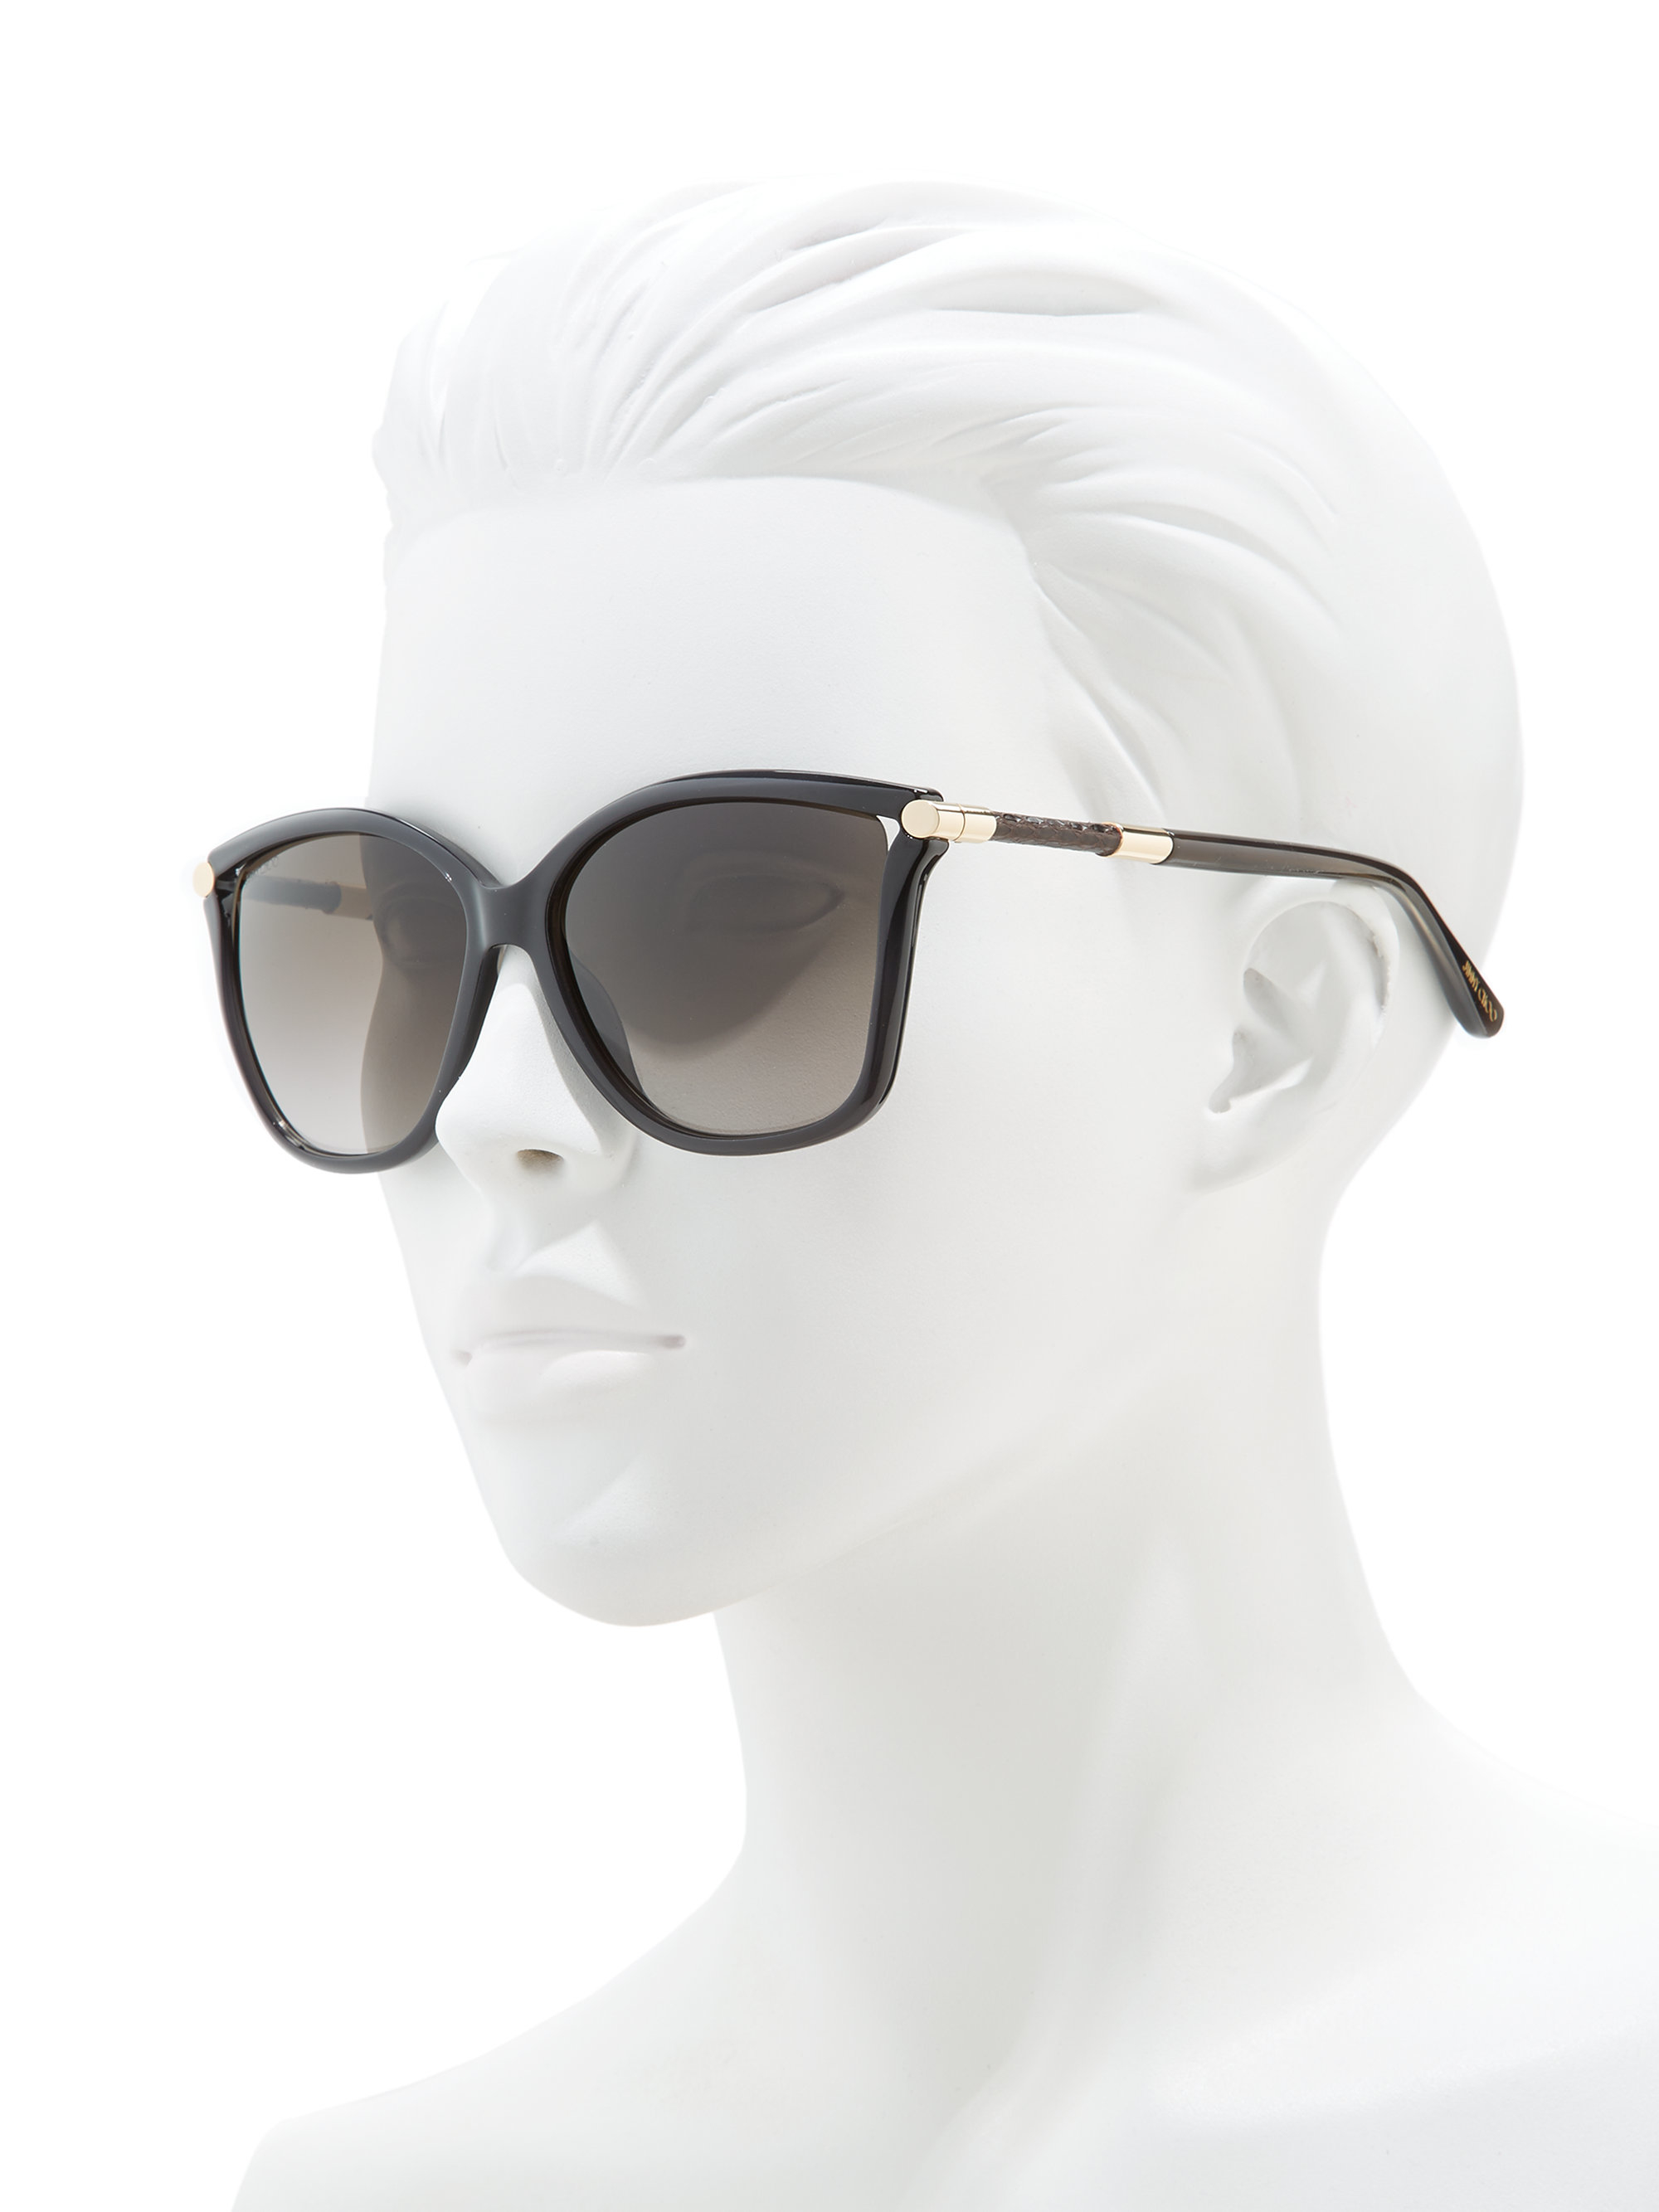 cheap jimmy choo sunglasses jp6l  discount jimmy choo sunglasses celebrity men